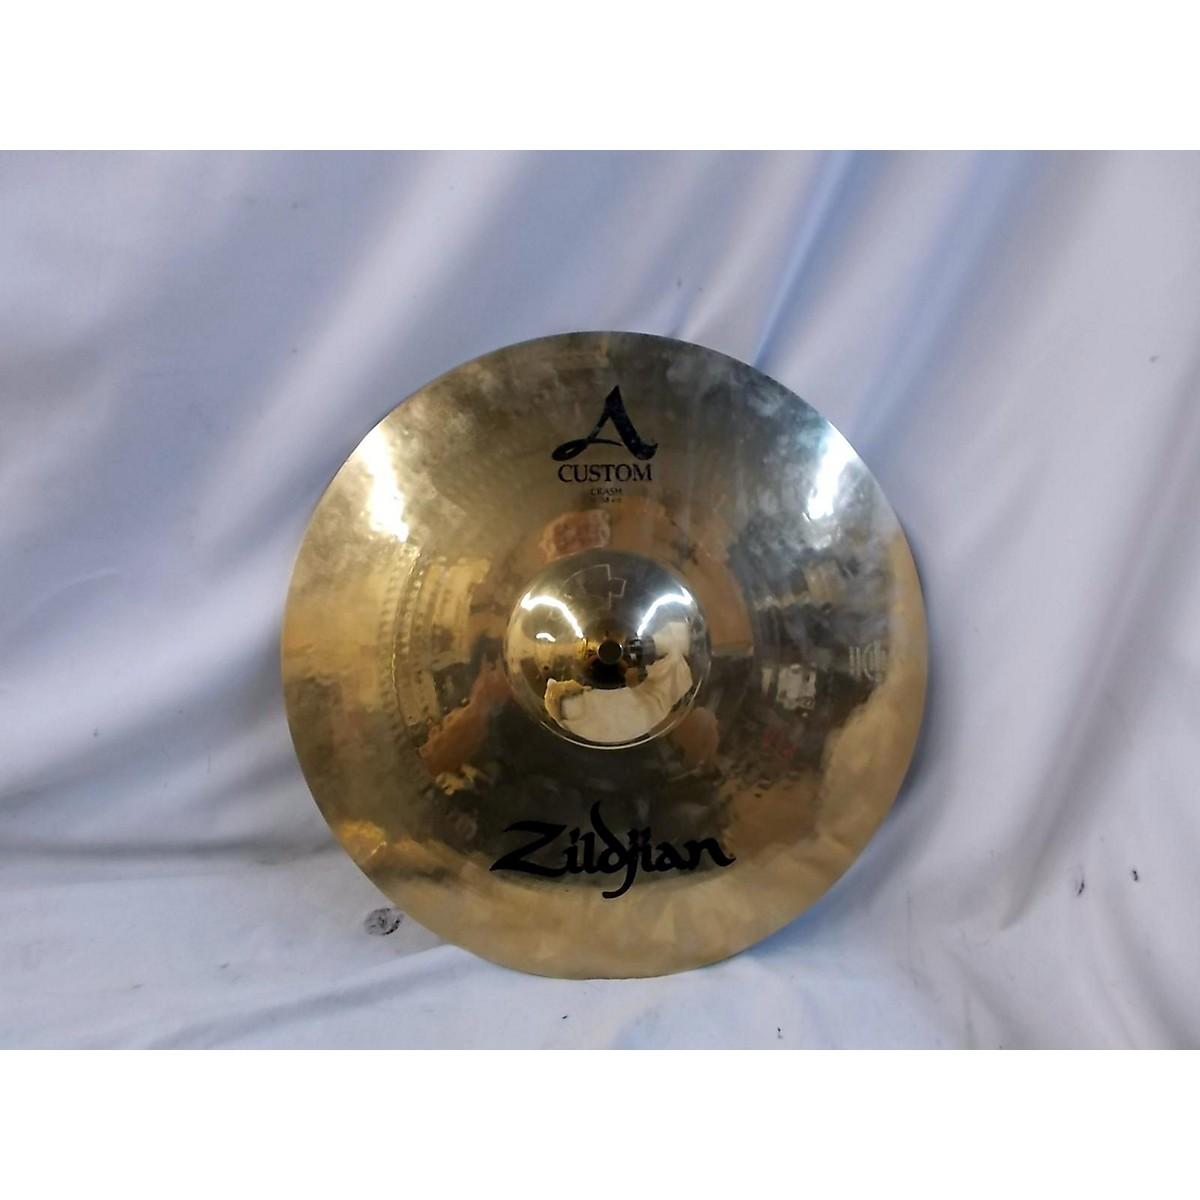 Zildjian 2010s 15in A Custom Crash Cymbal